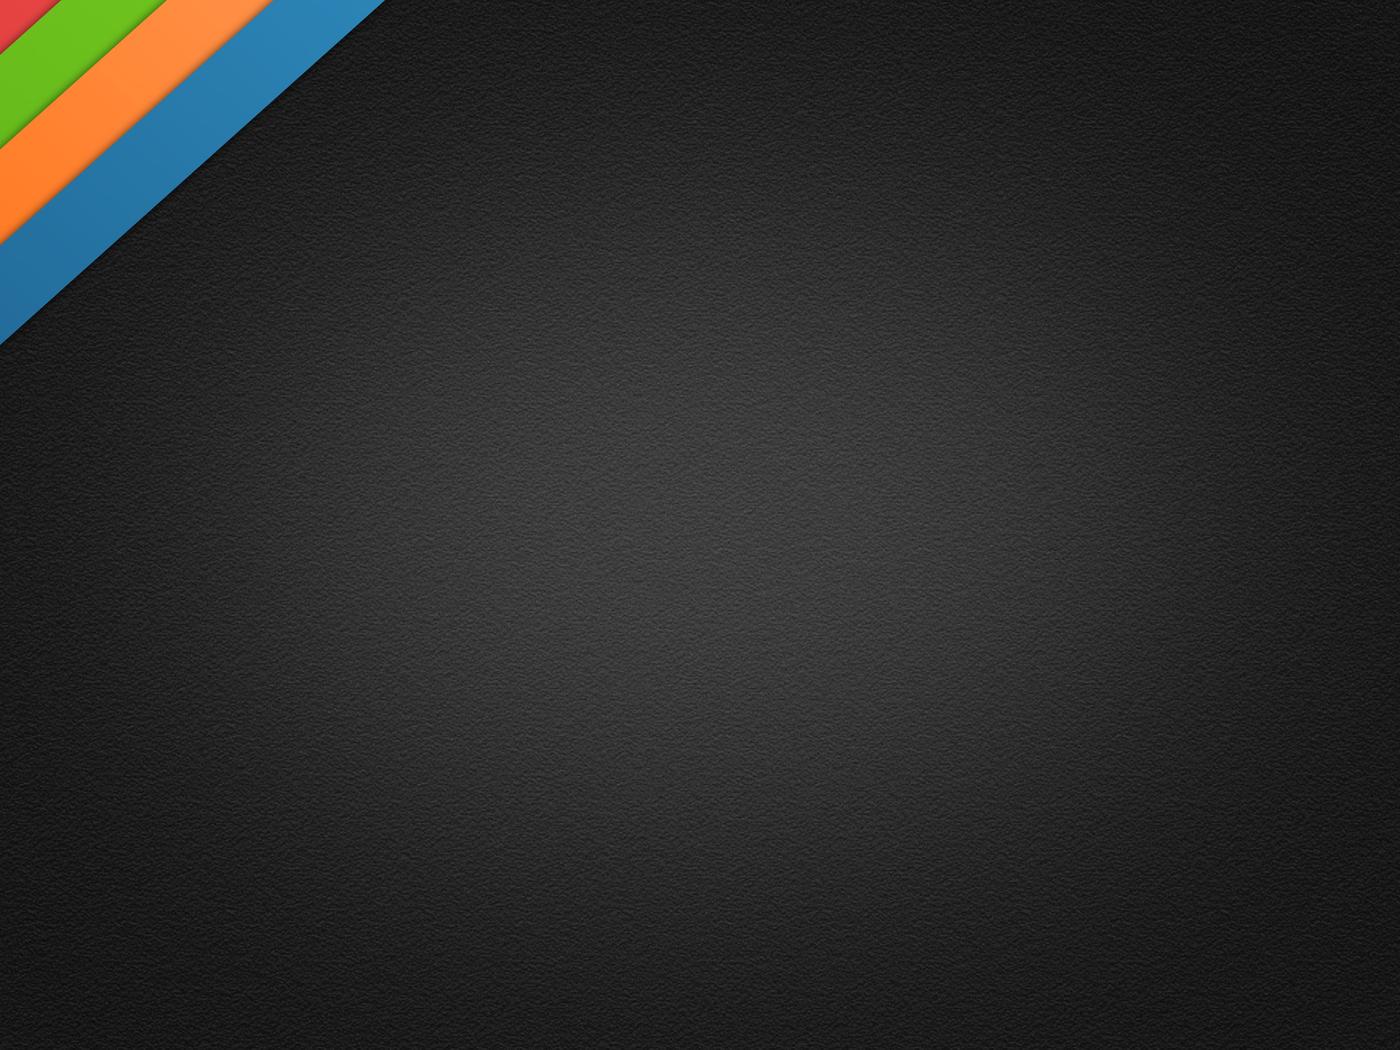 corner-strip-simple-graphics.jpg